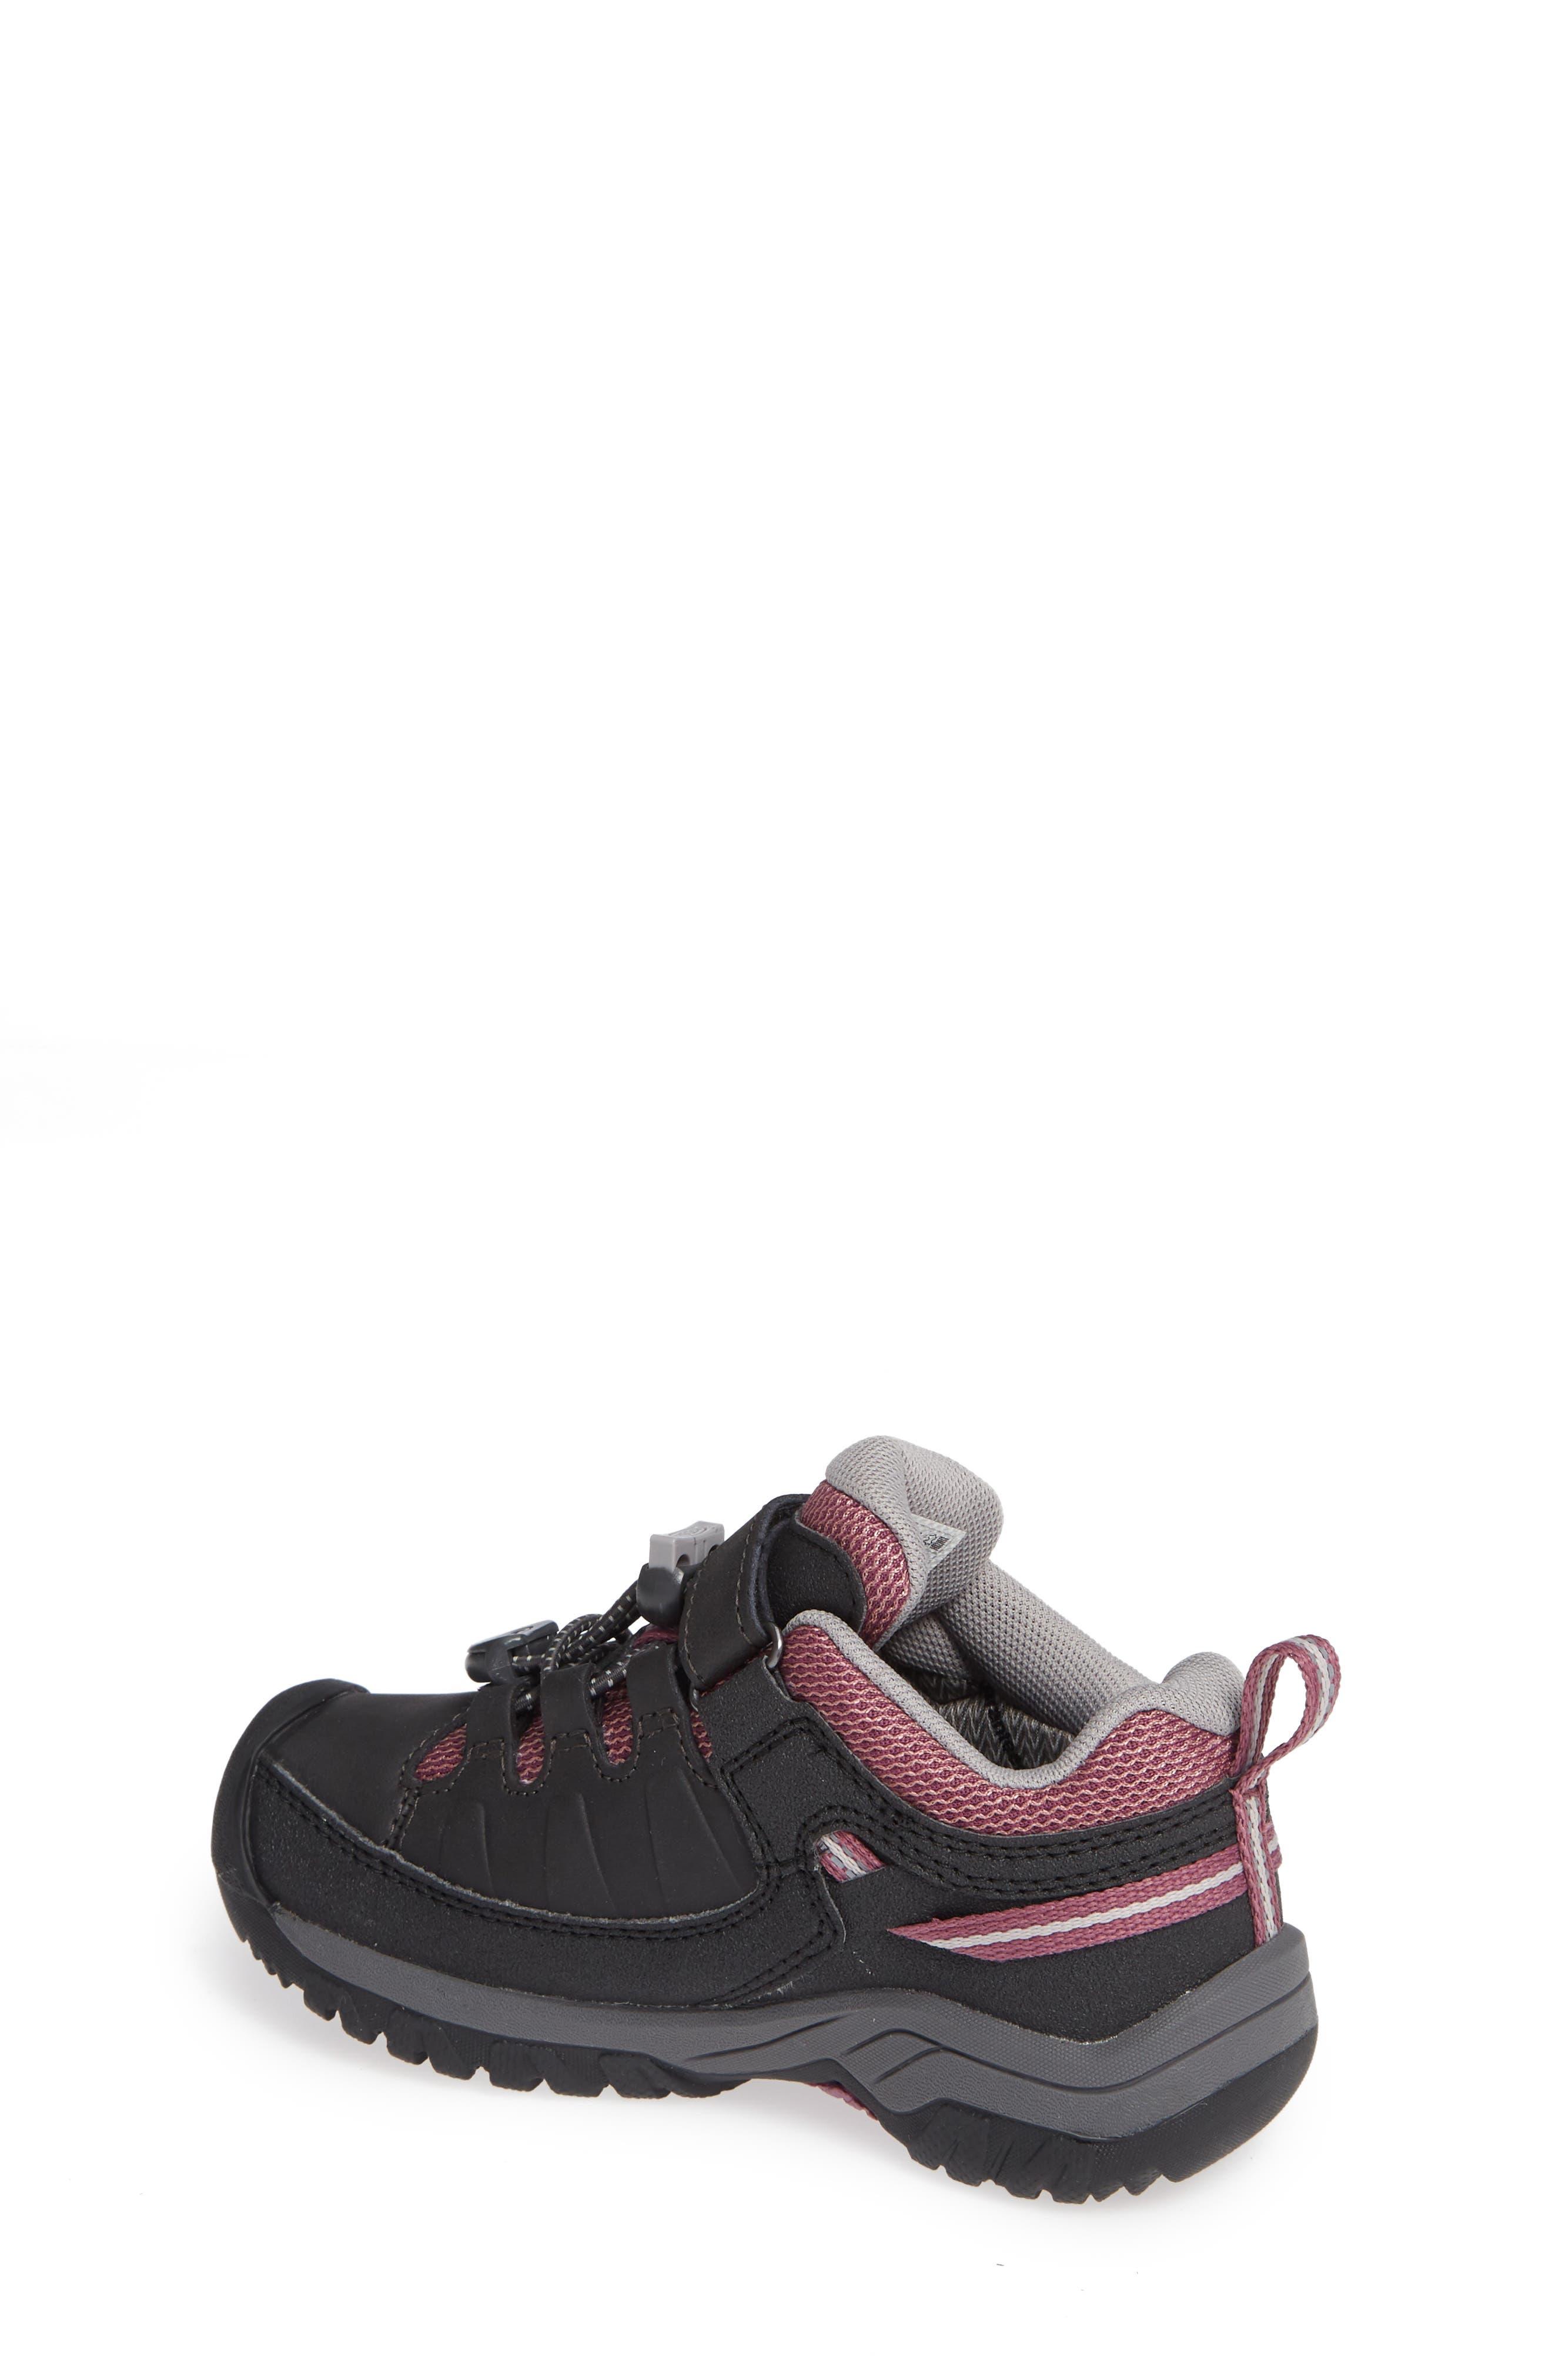 KEEN, Targhee Low Waterproof Sneaker, Alternate thumbnail 2, color, RAVEN/ TULIPWOOD